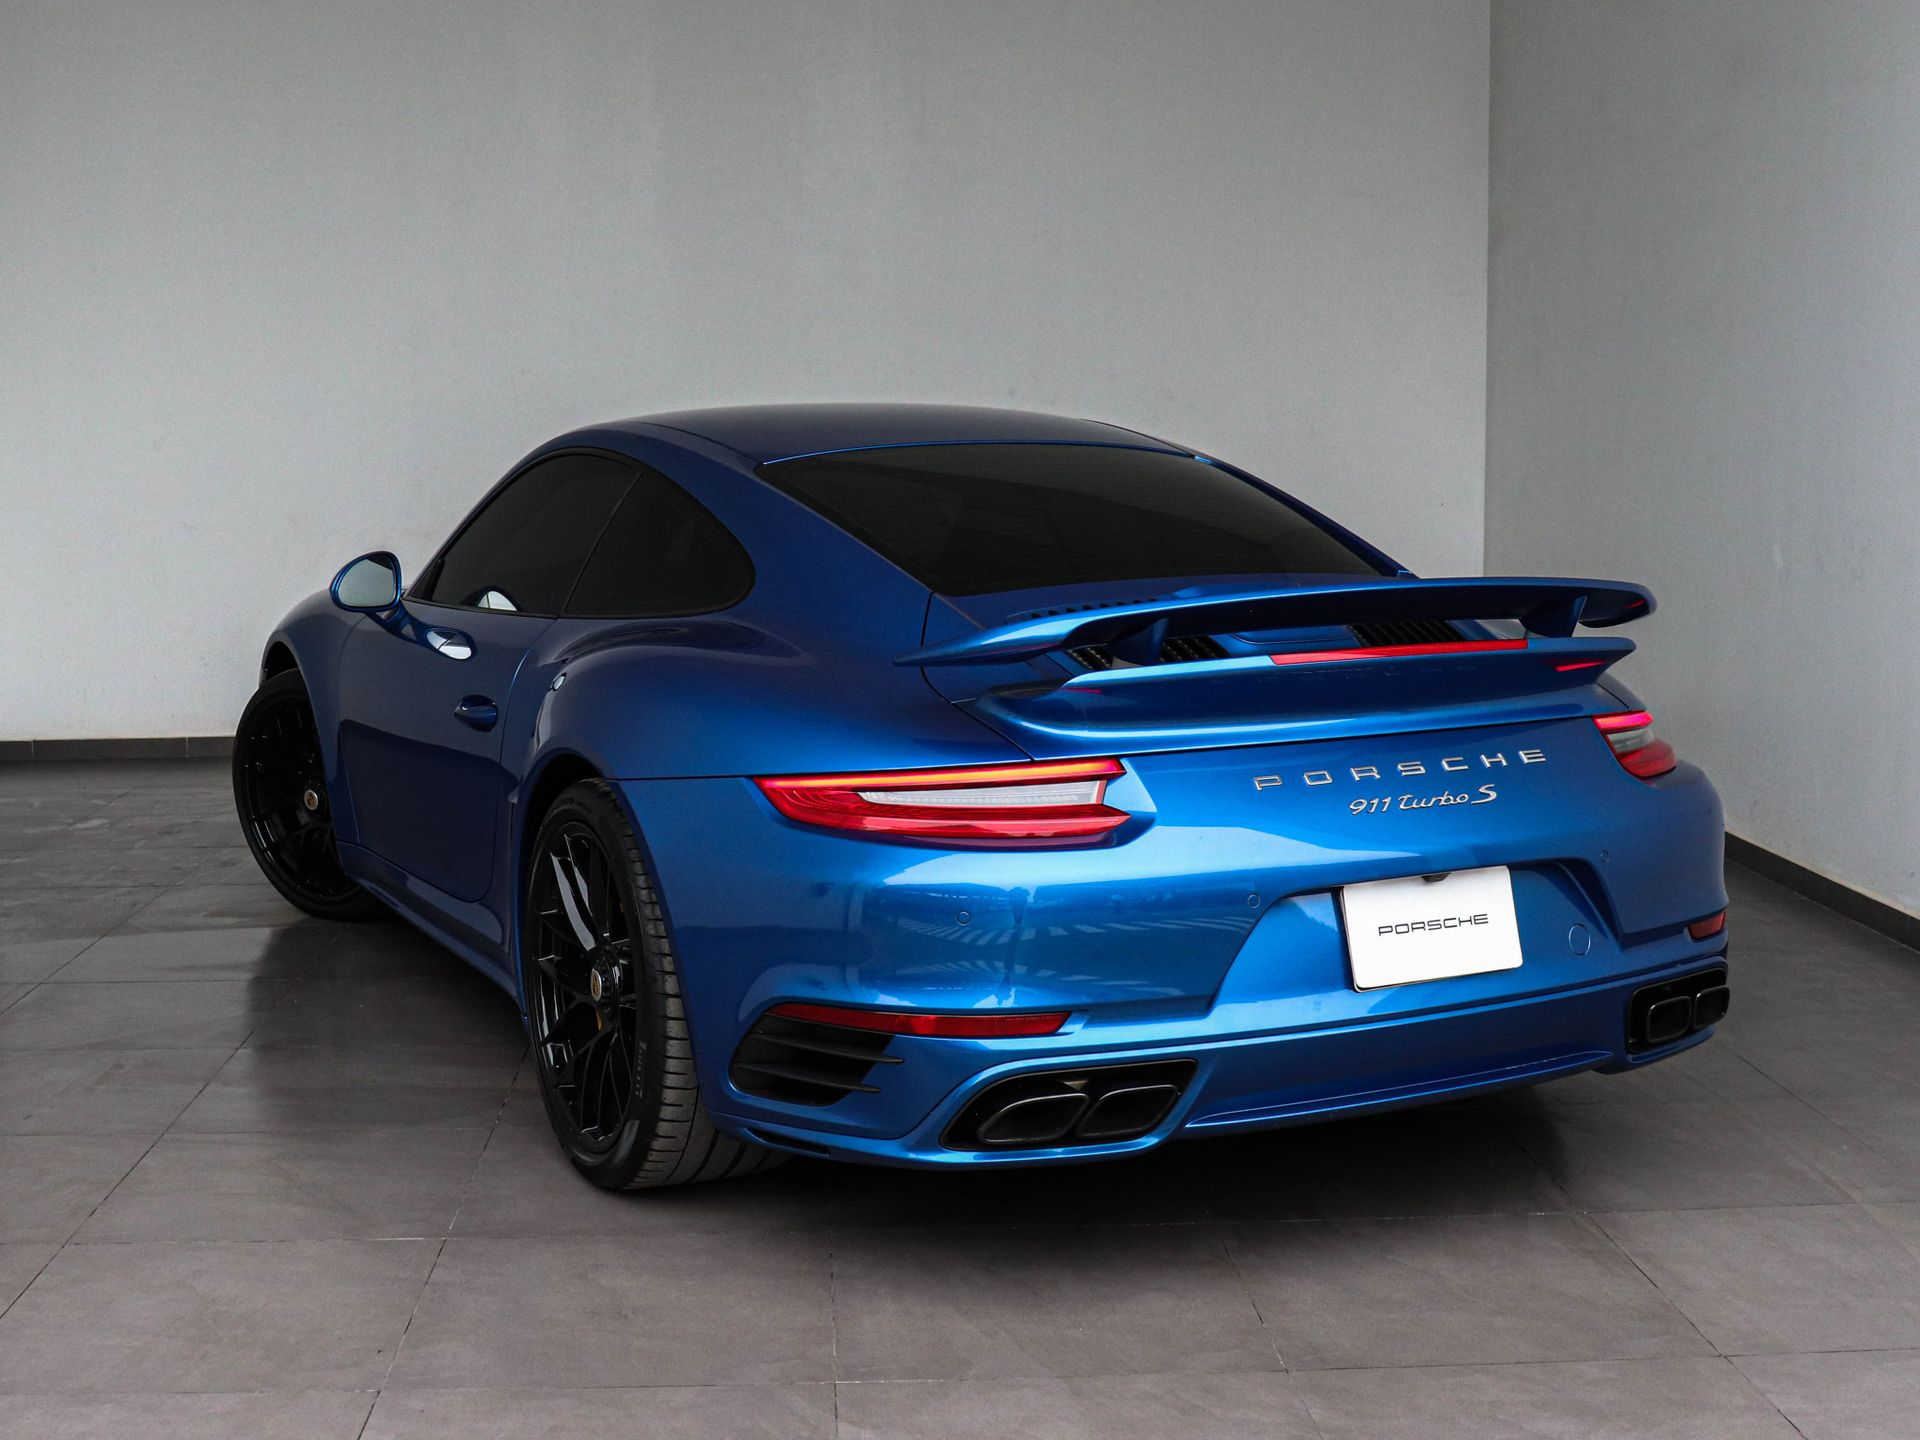 2017 Porsche 911 Turbo S – 3